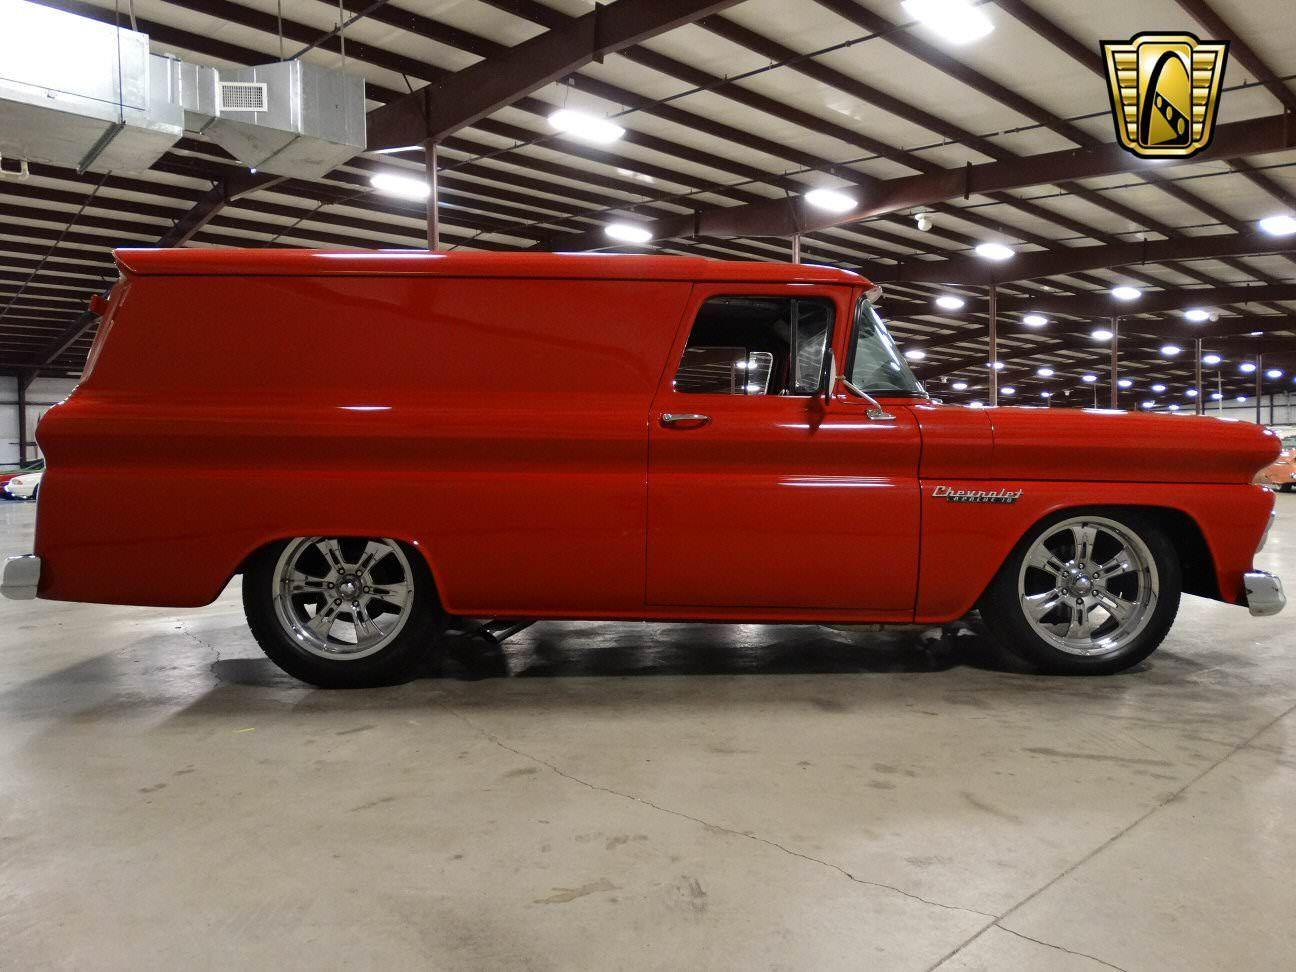 1960 Chevrolet Apache Panel Truck 4 Panel Truck Classic Cars